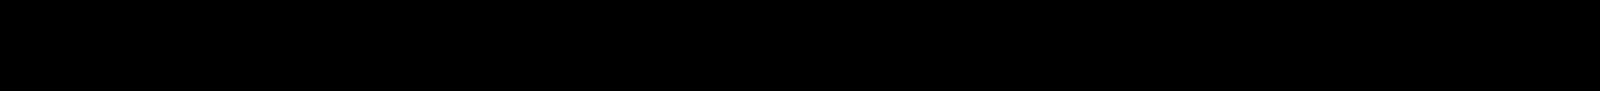 DIVIDER LINES - ClipArt Best